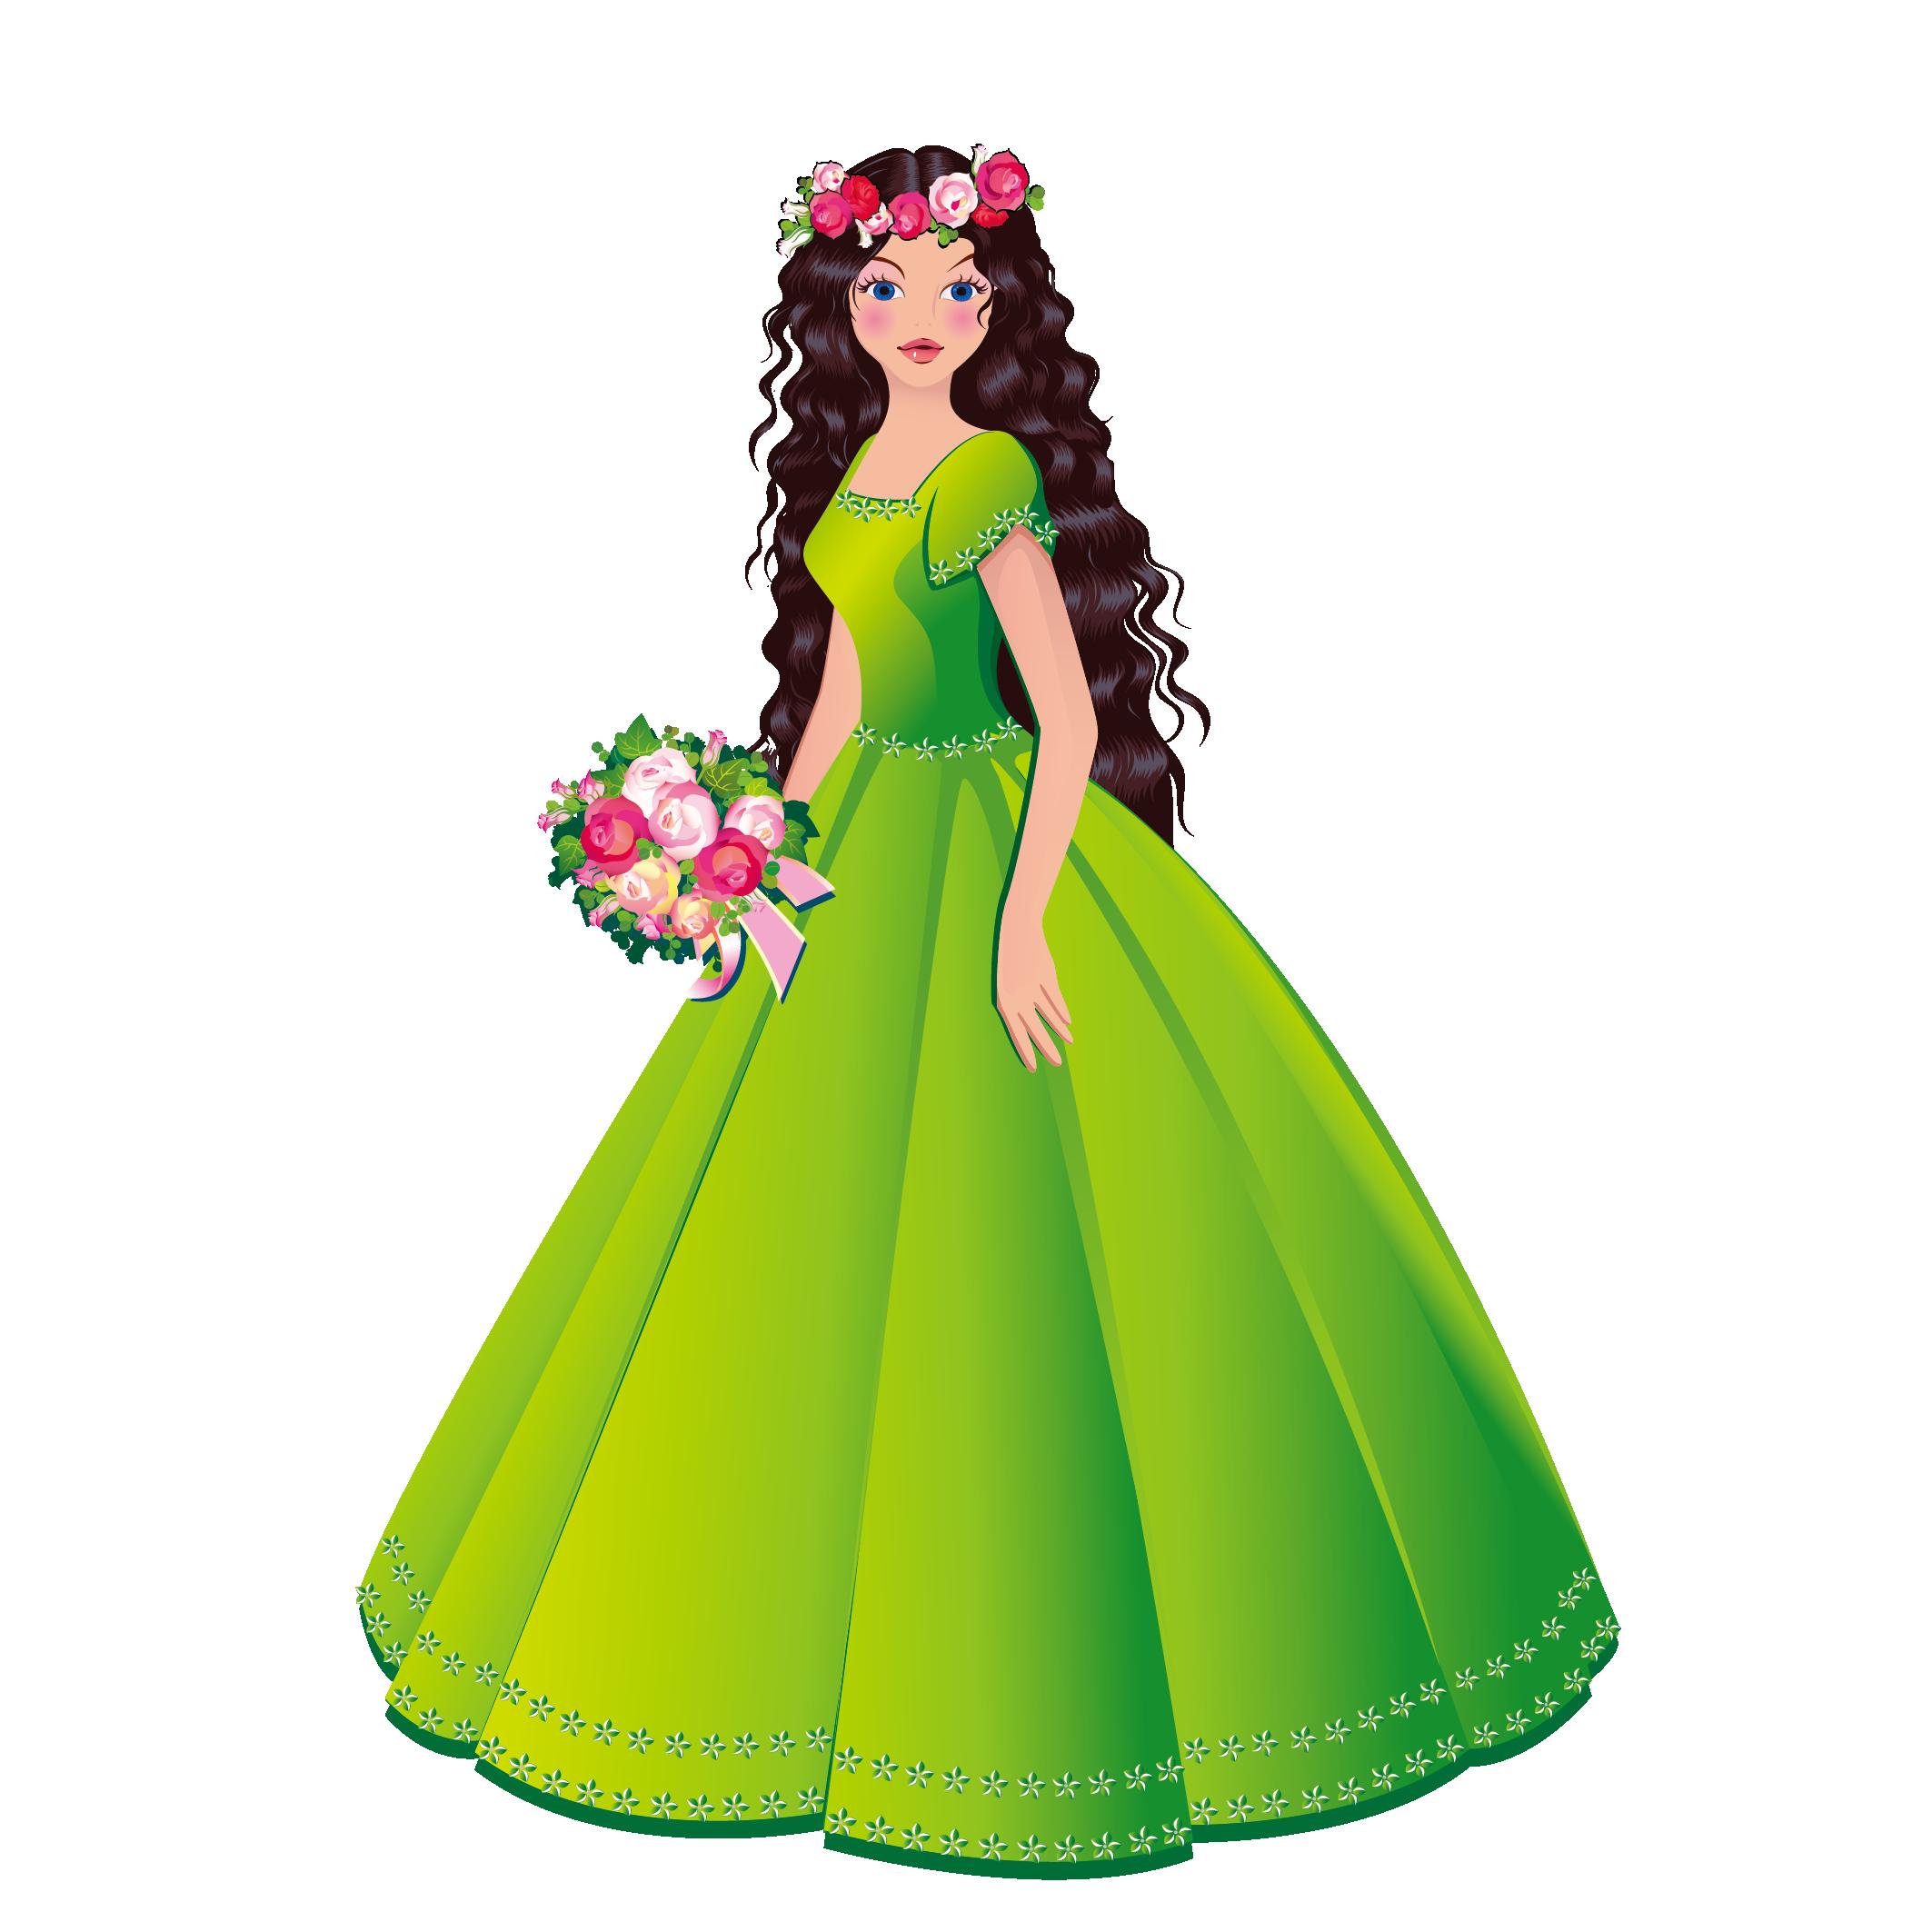 Princess clipart beautiful princess. Royalty free stock photography